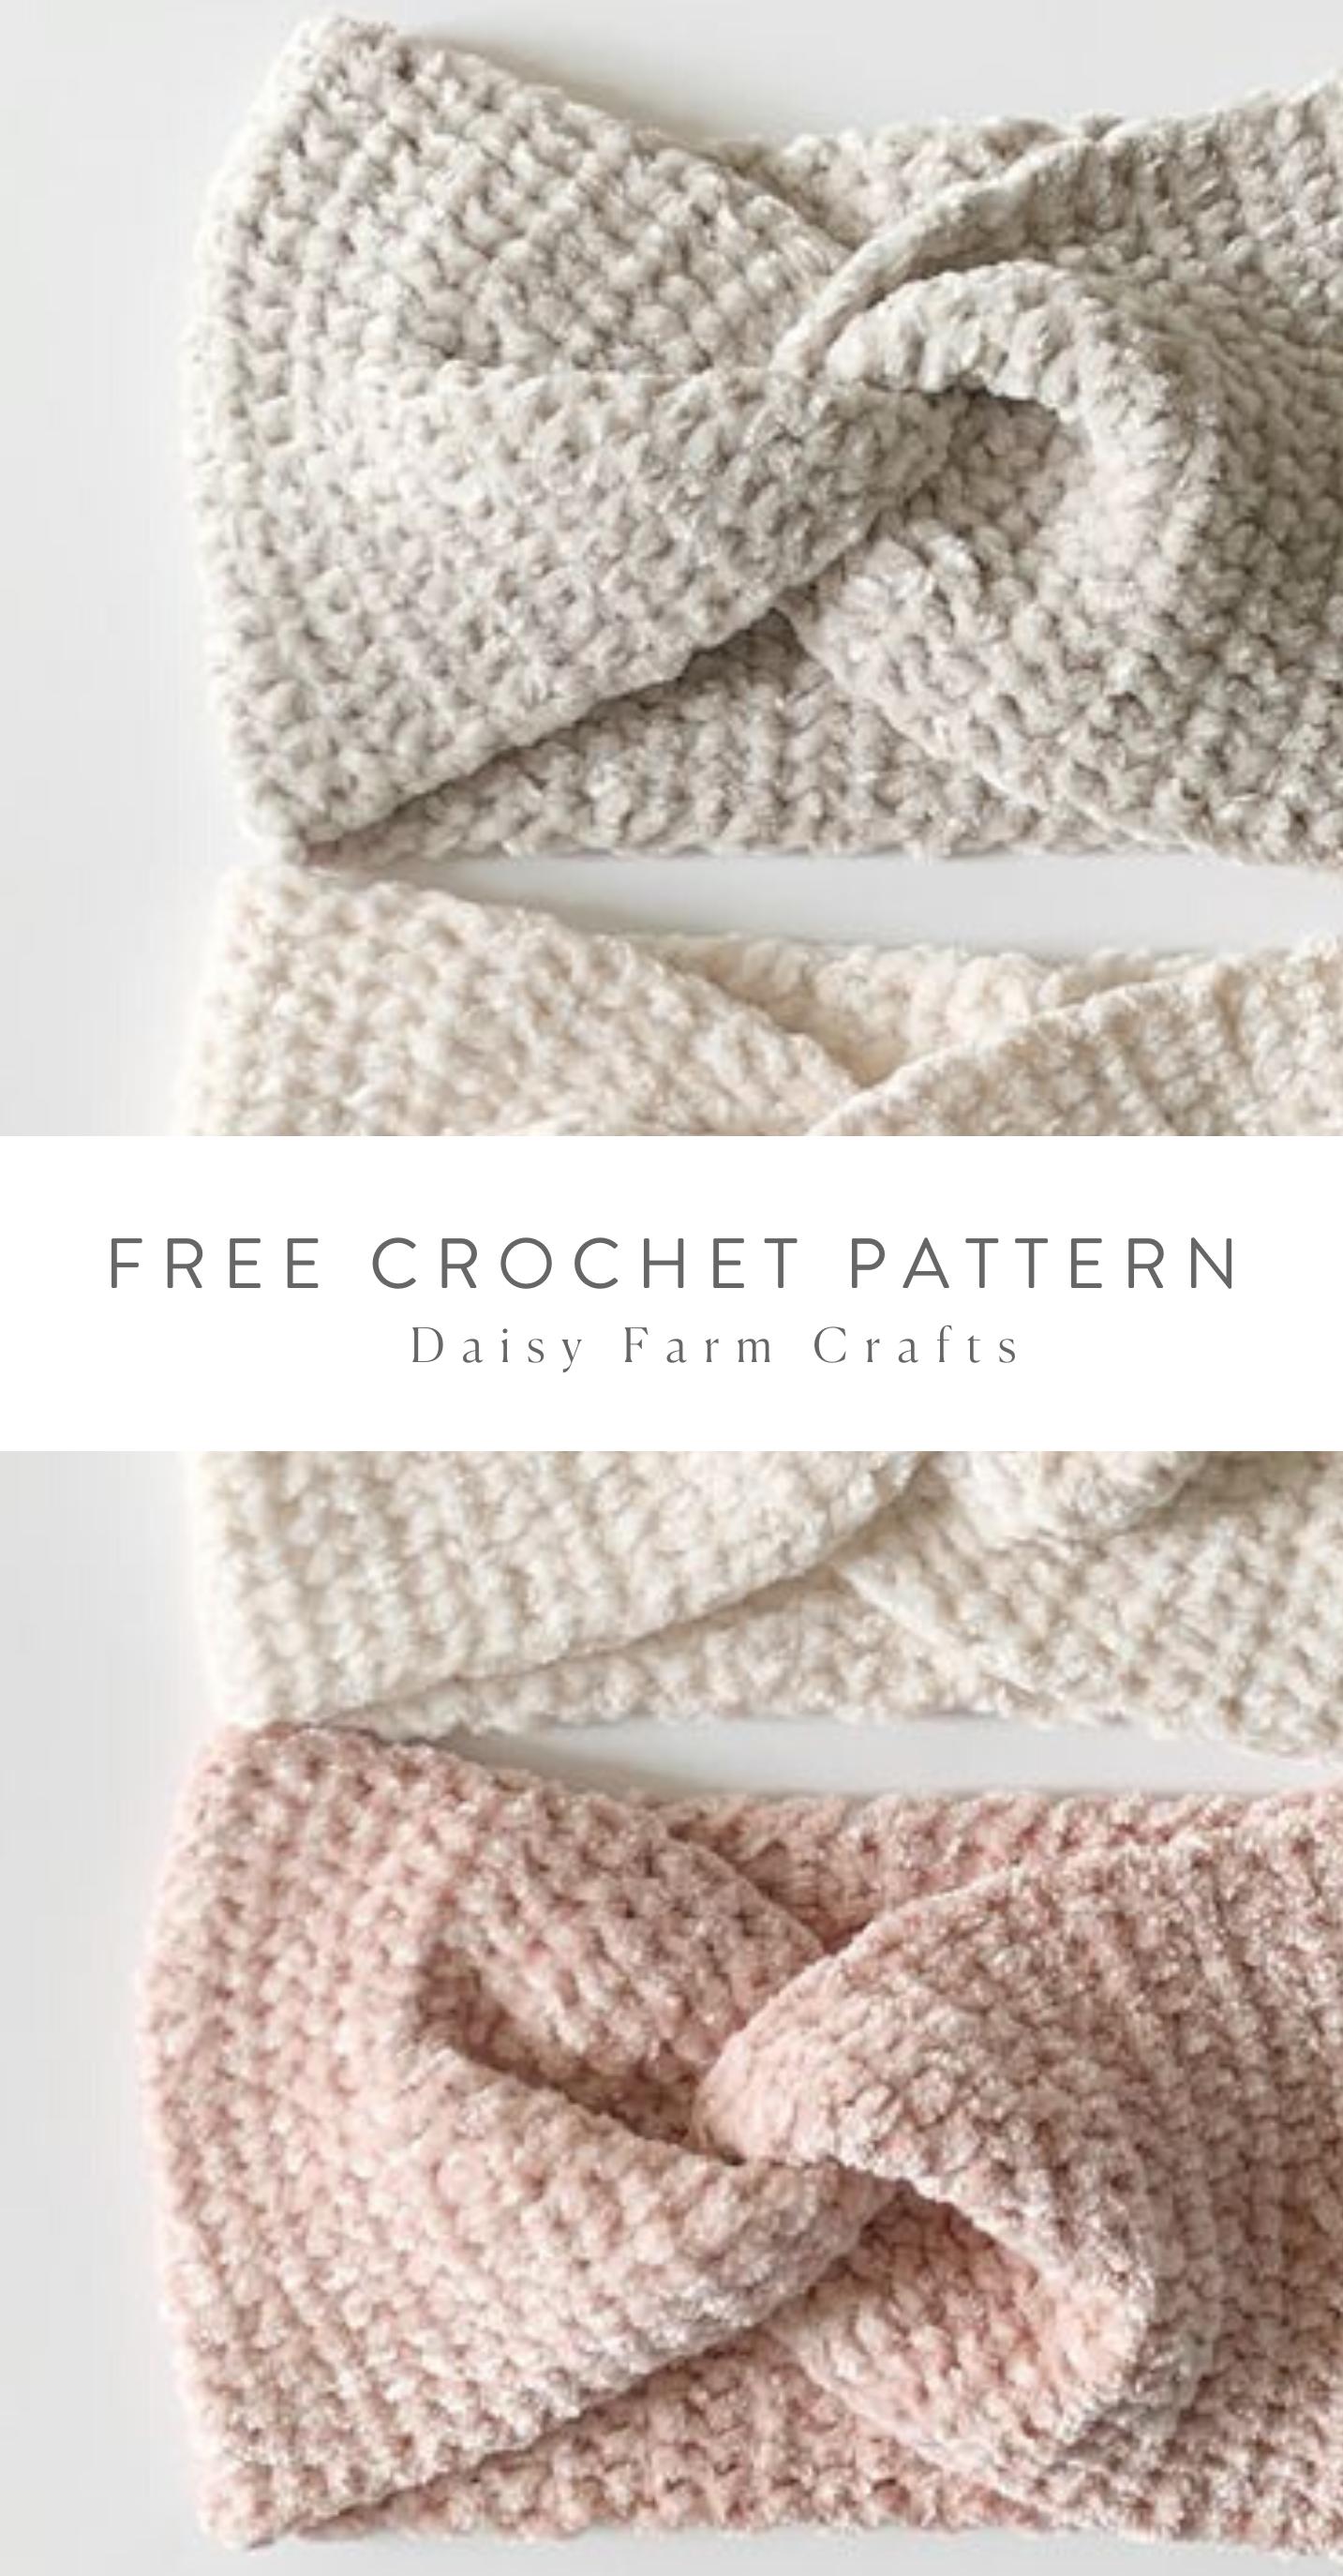 Free Crochet Pattern - Easy Velvet Twist Headband